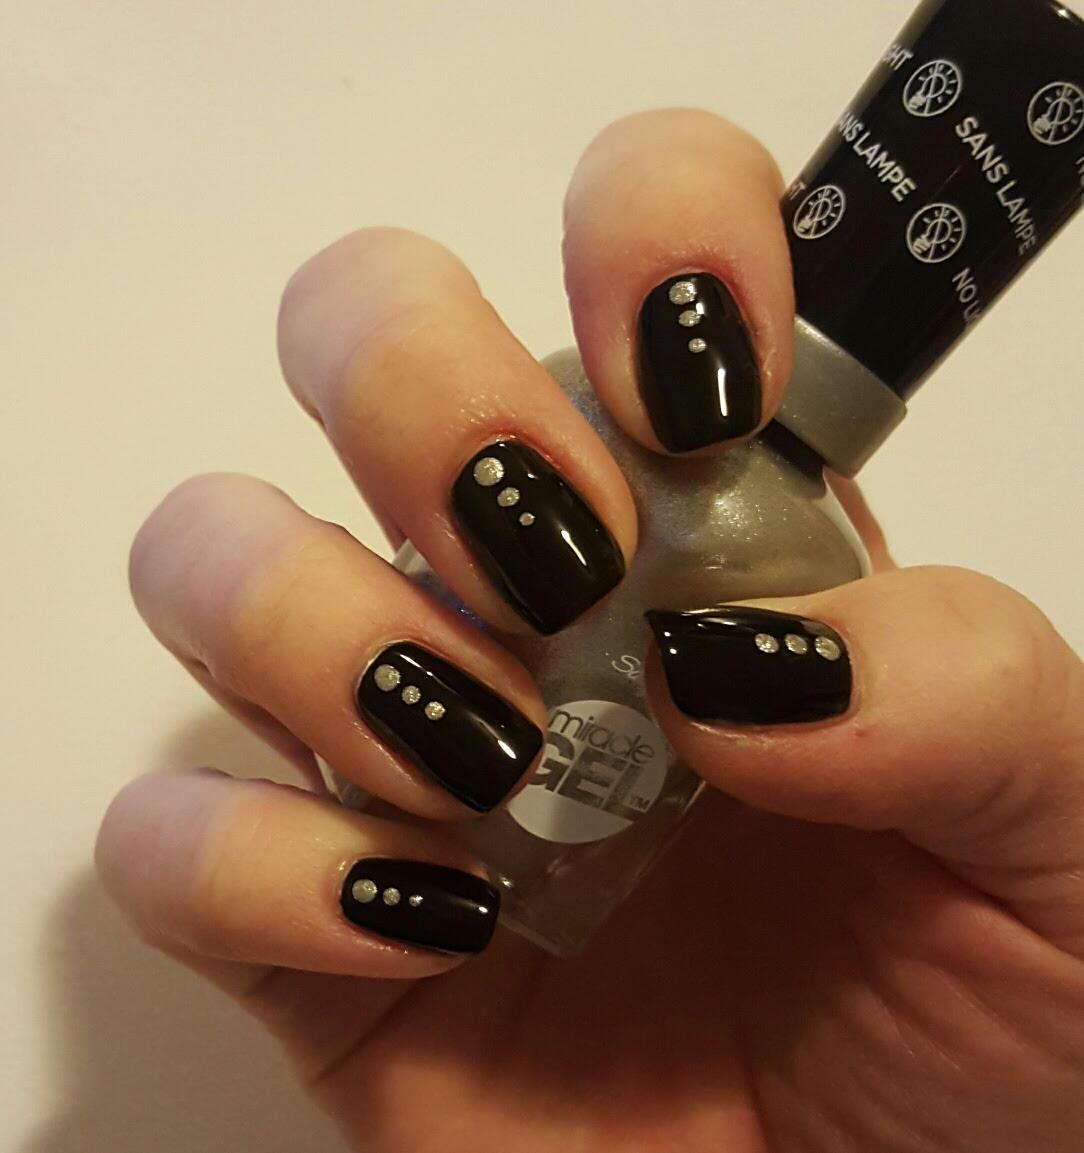 black w silver spots nails